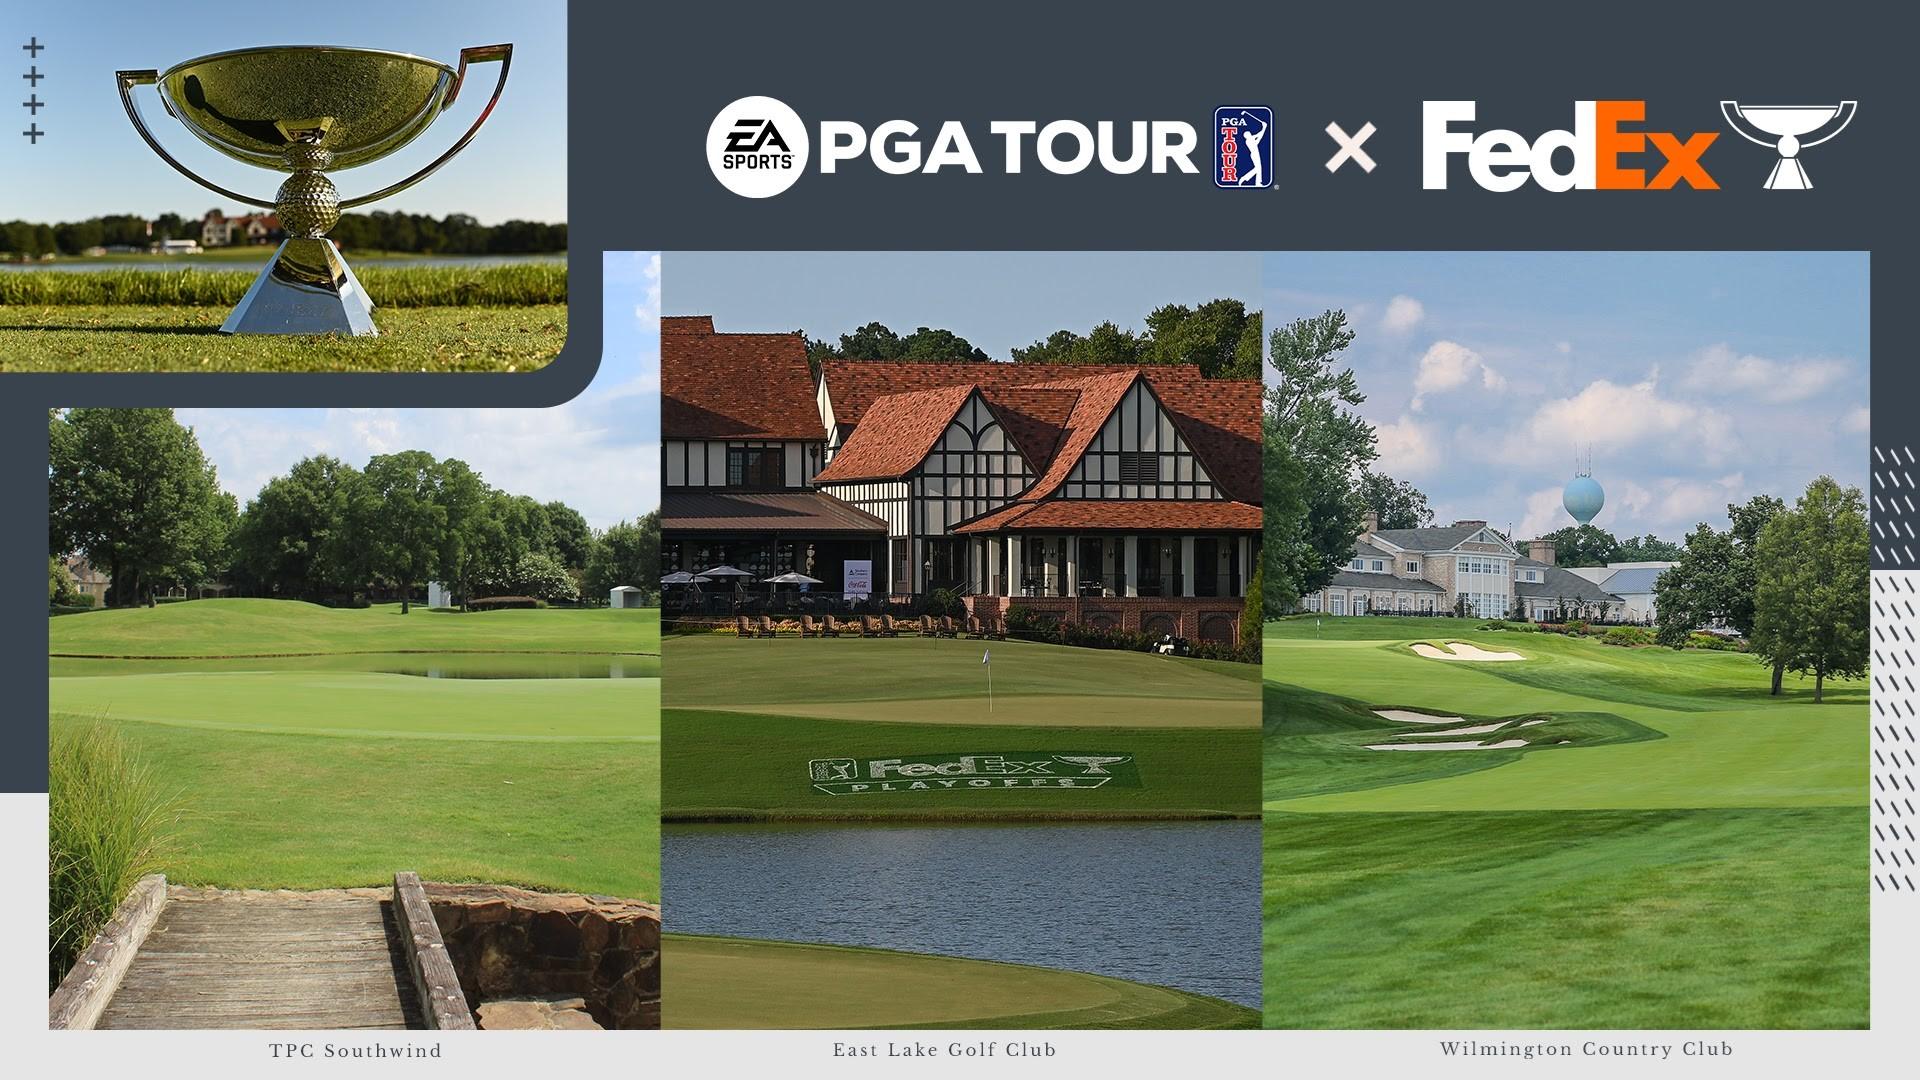 PGA TOUR DI EA SPORTS: AGGIUNTI I PLAYOFF FEDEXCUP